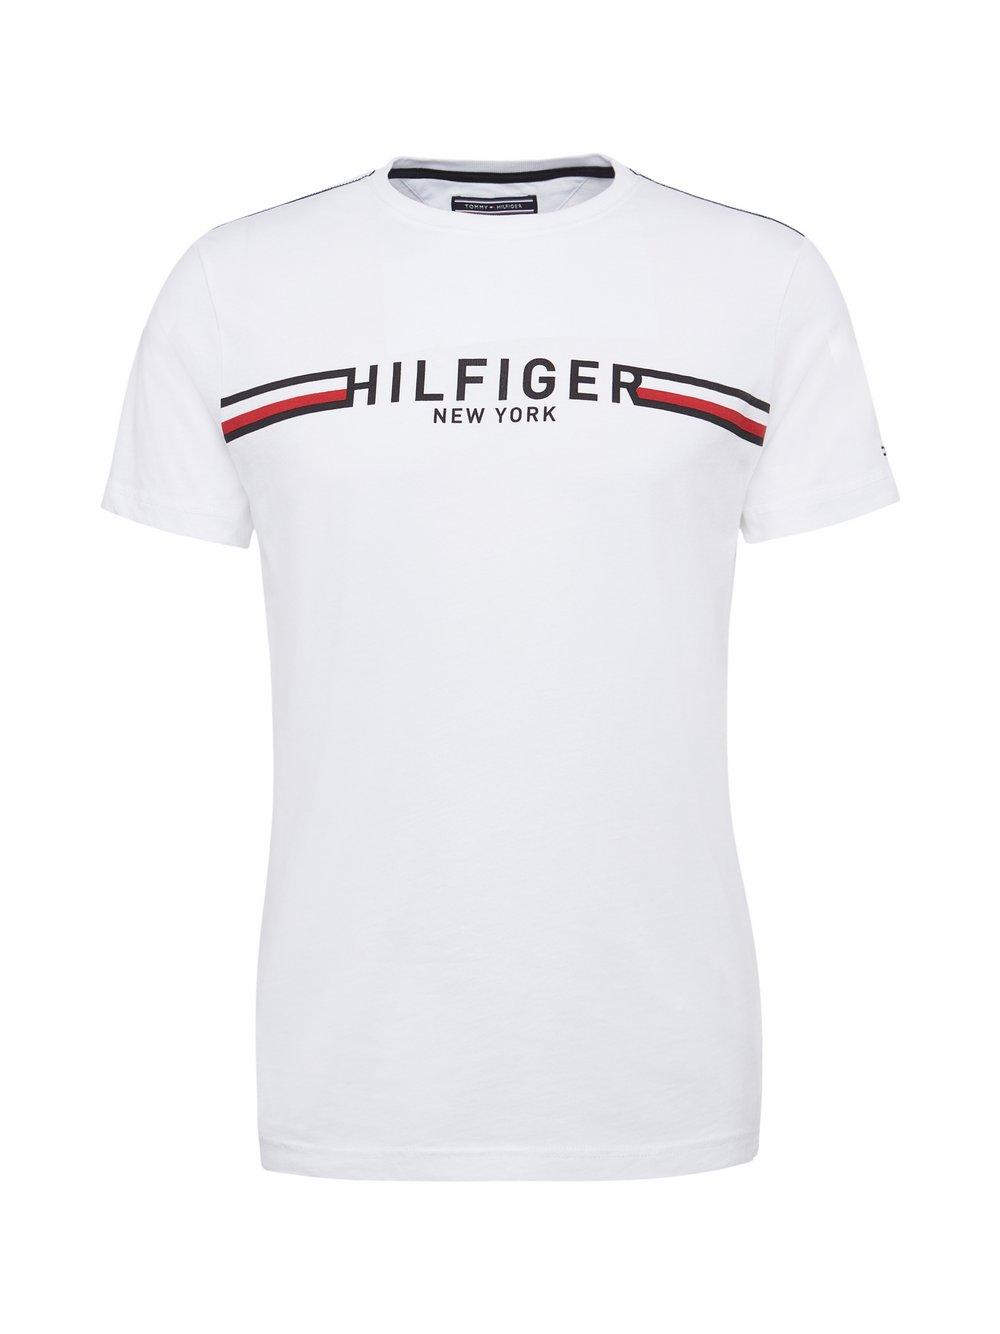 innovative design 6f522 e6f30 Tommy Hilfiger Herren T Shirt Flag Tee - Nils Stucki ...